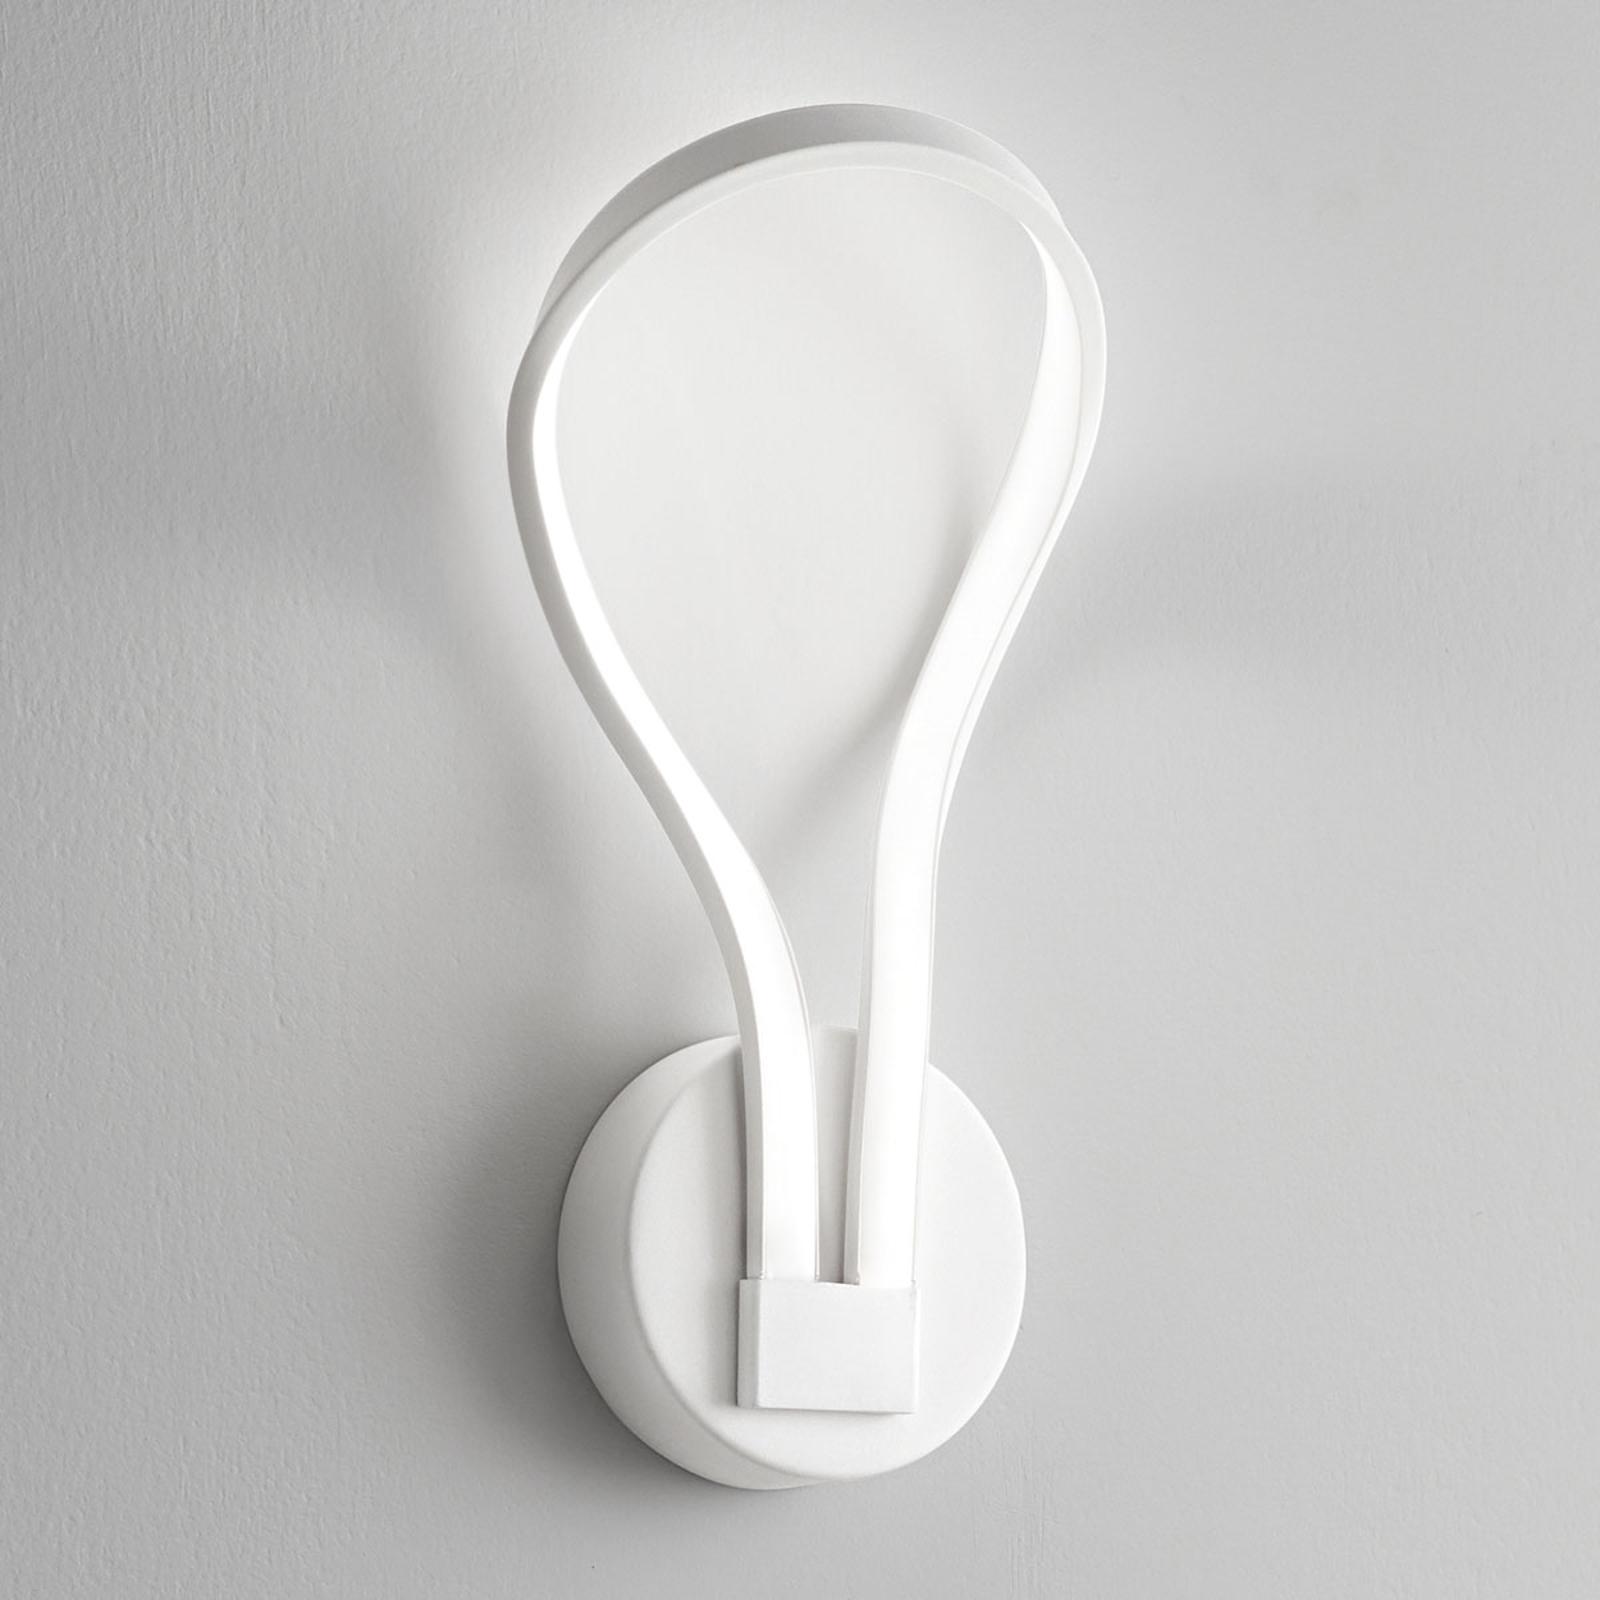 Applique LED Blossom, blanche-mate